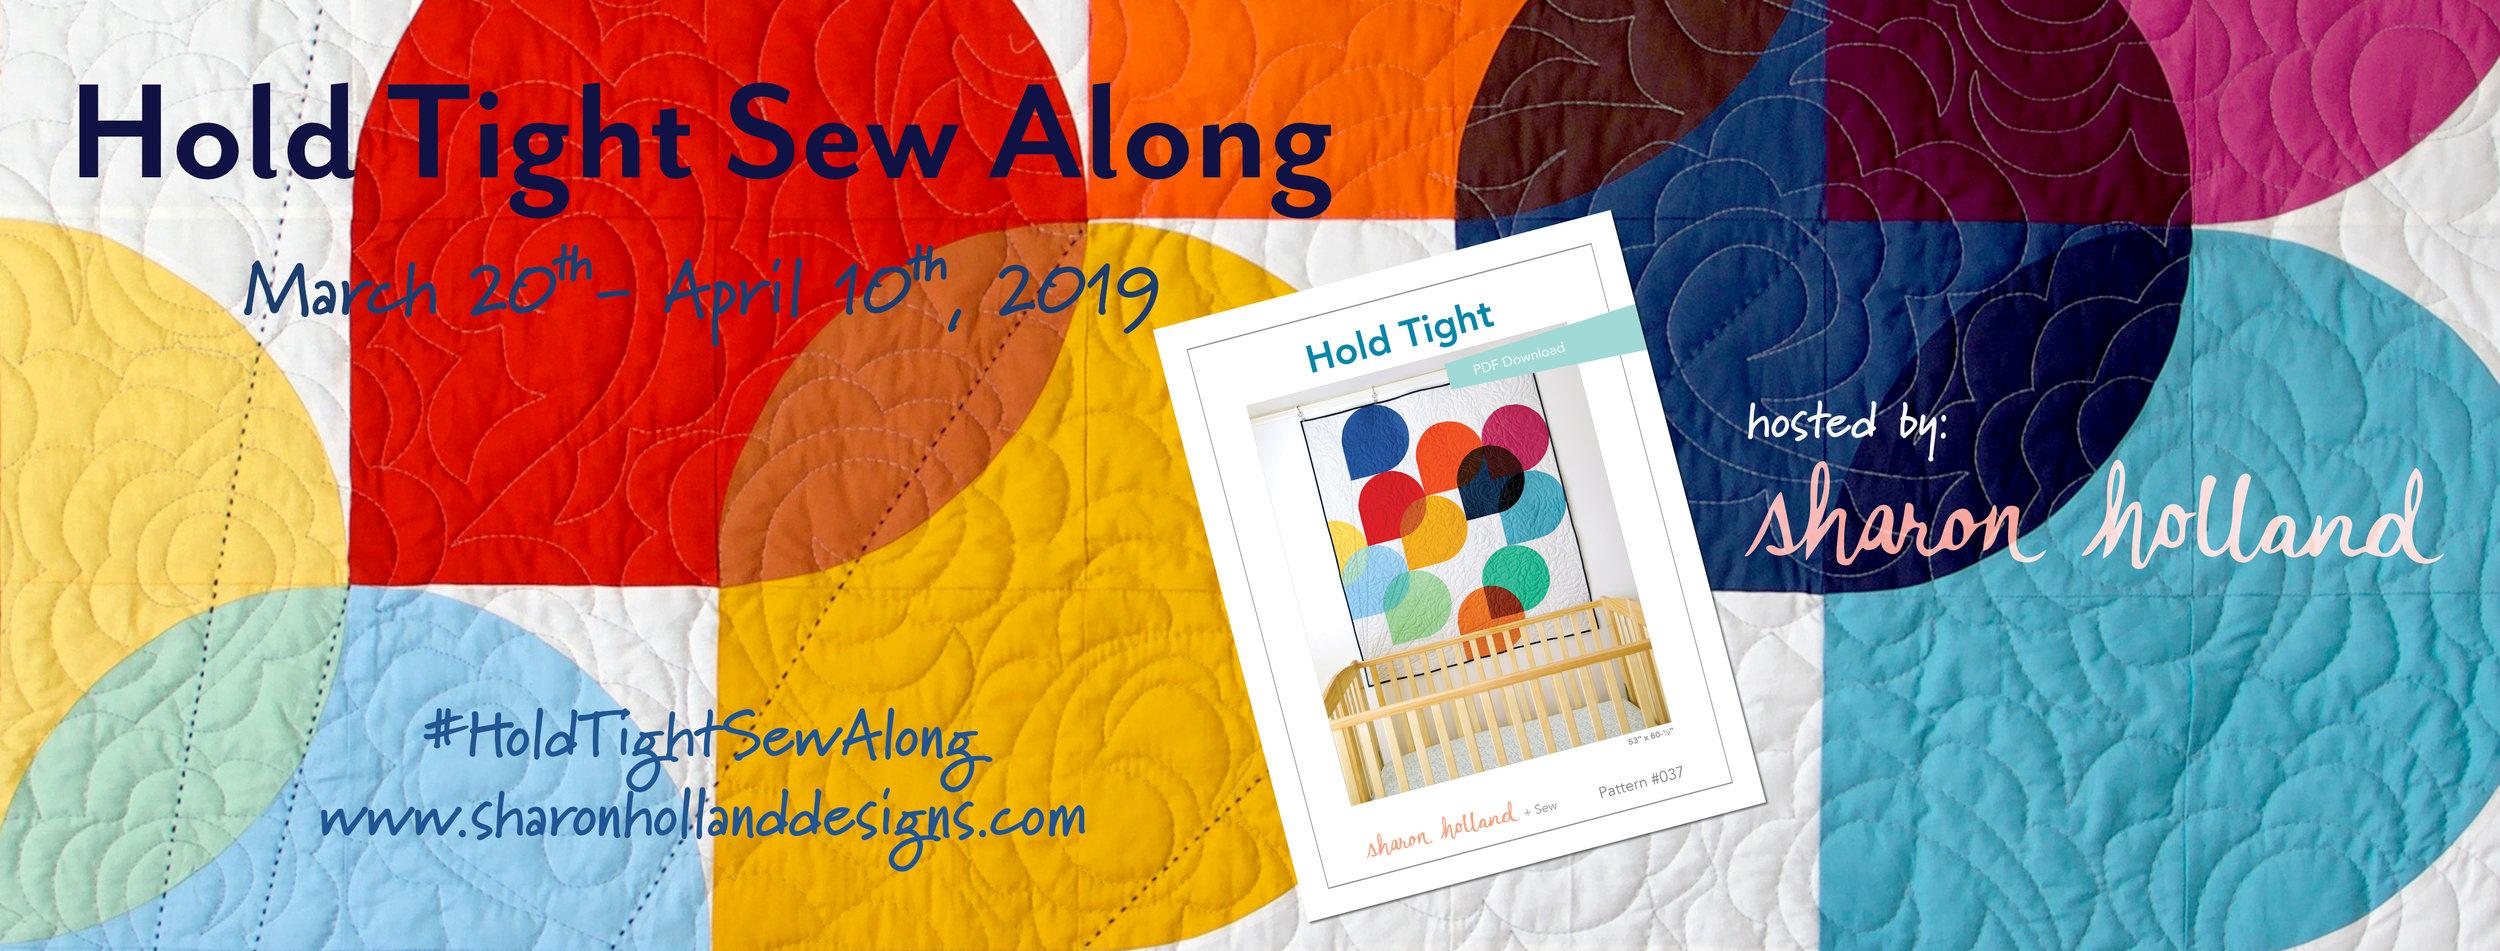 Hold Tight Sew Along Banner web.jpg